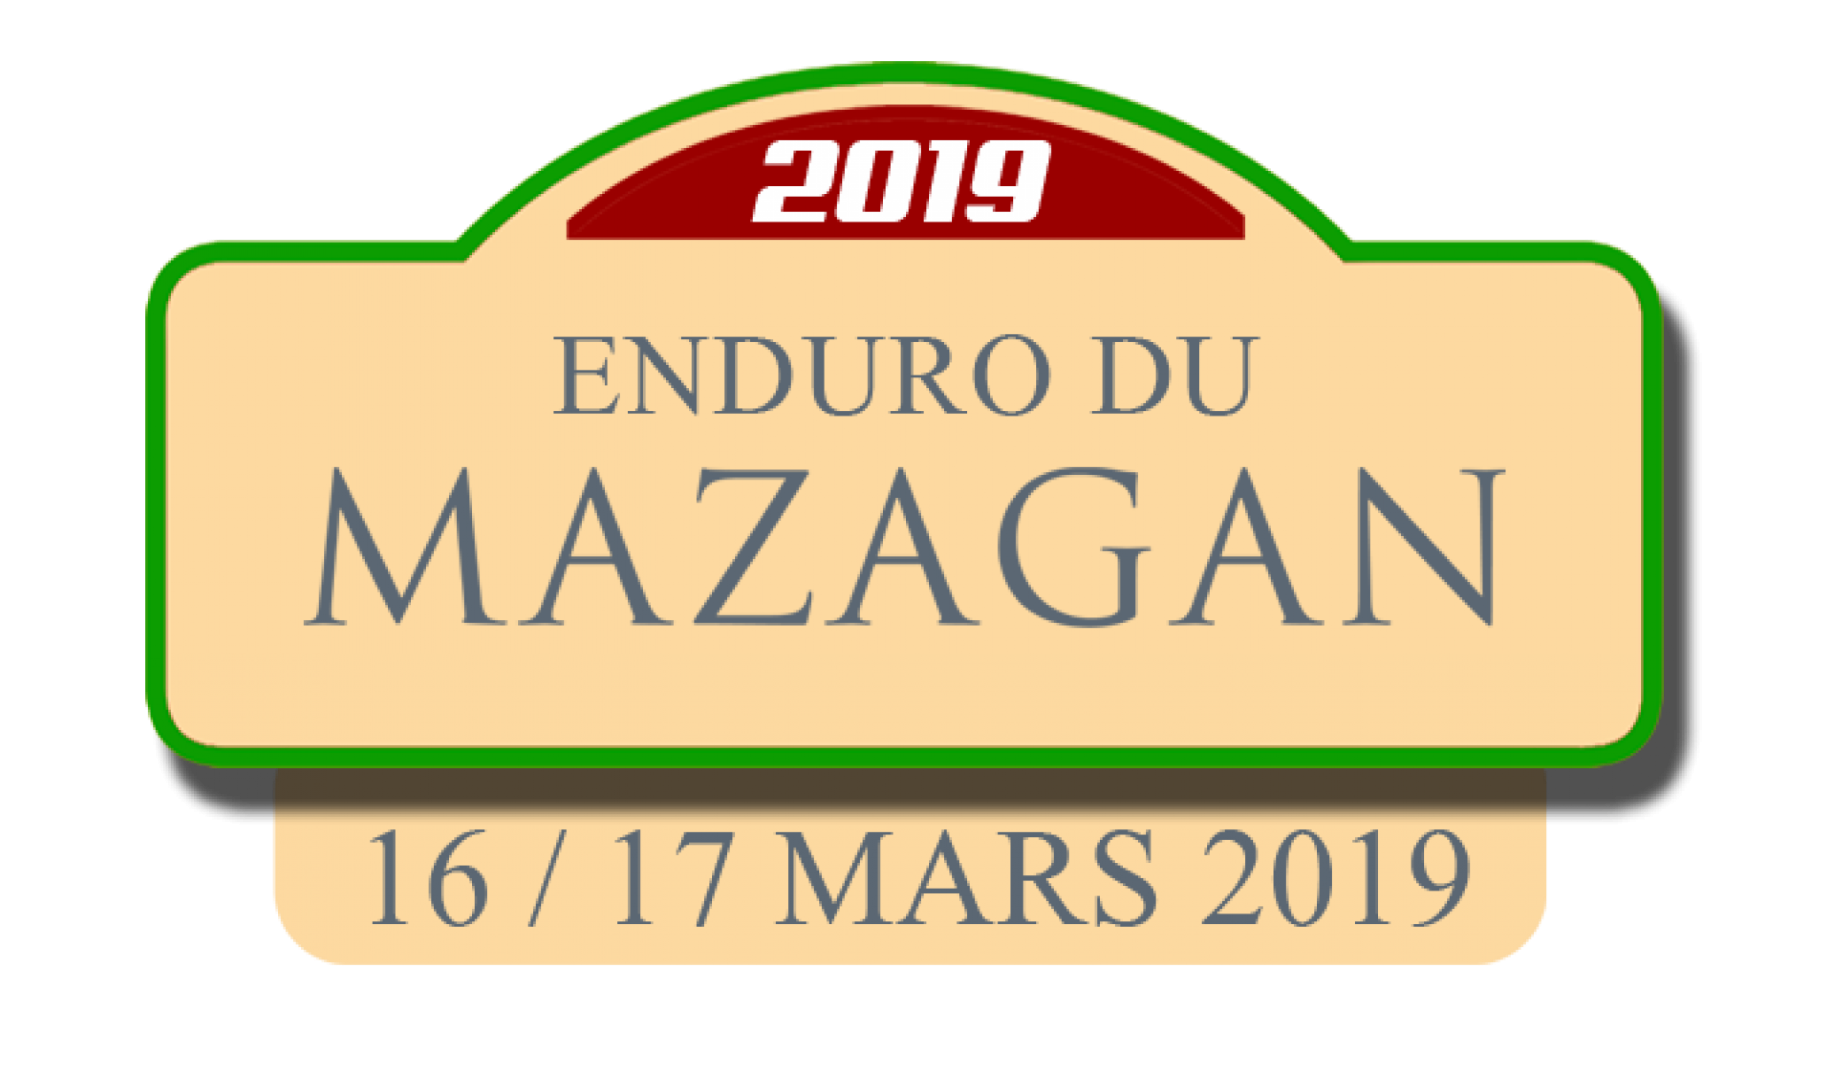 Enduro du Mazagan 2019